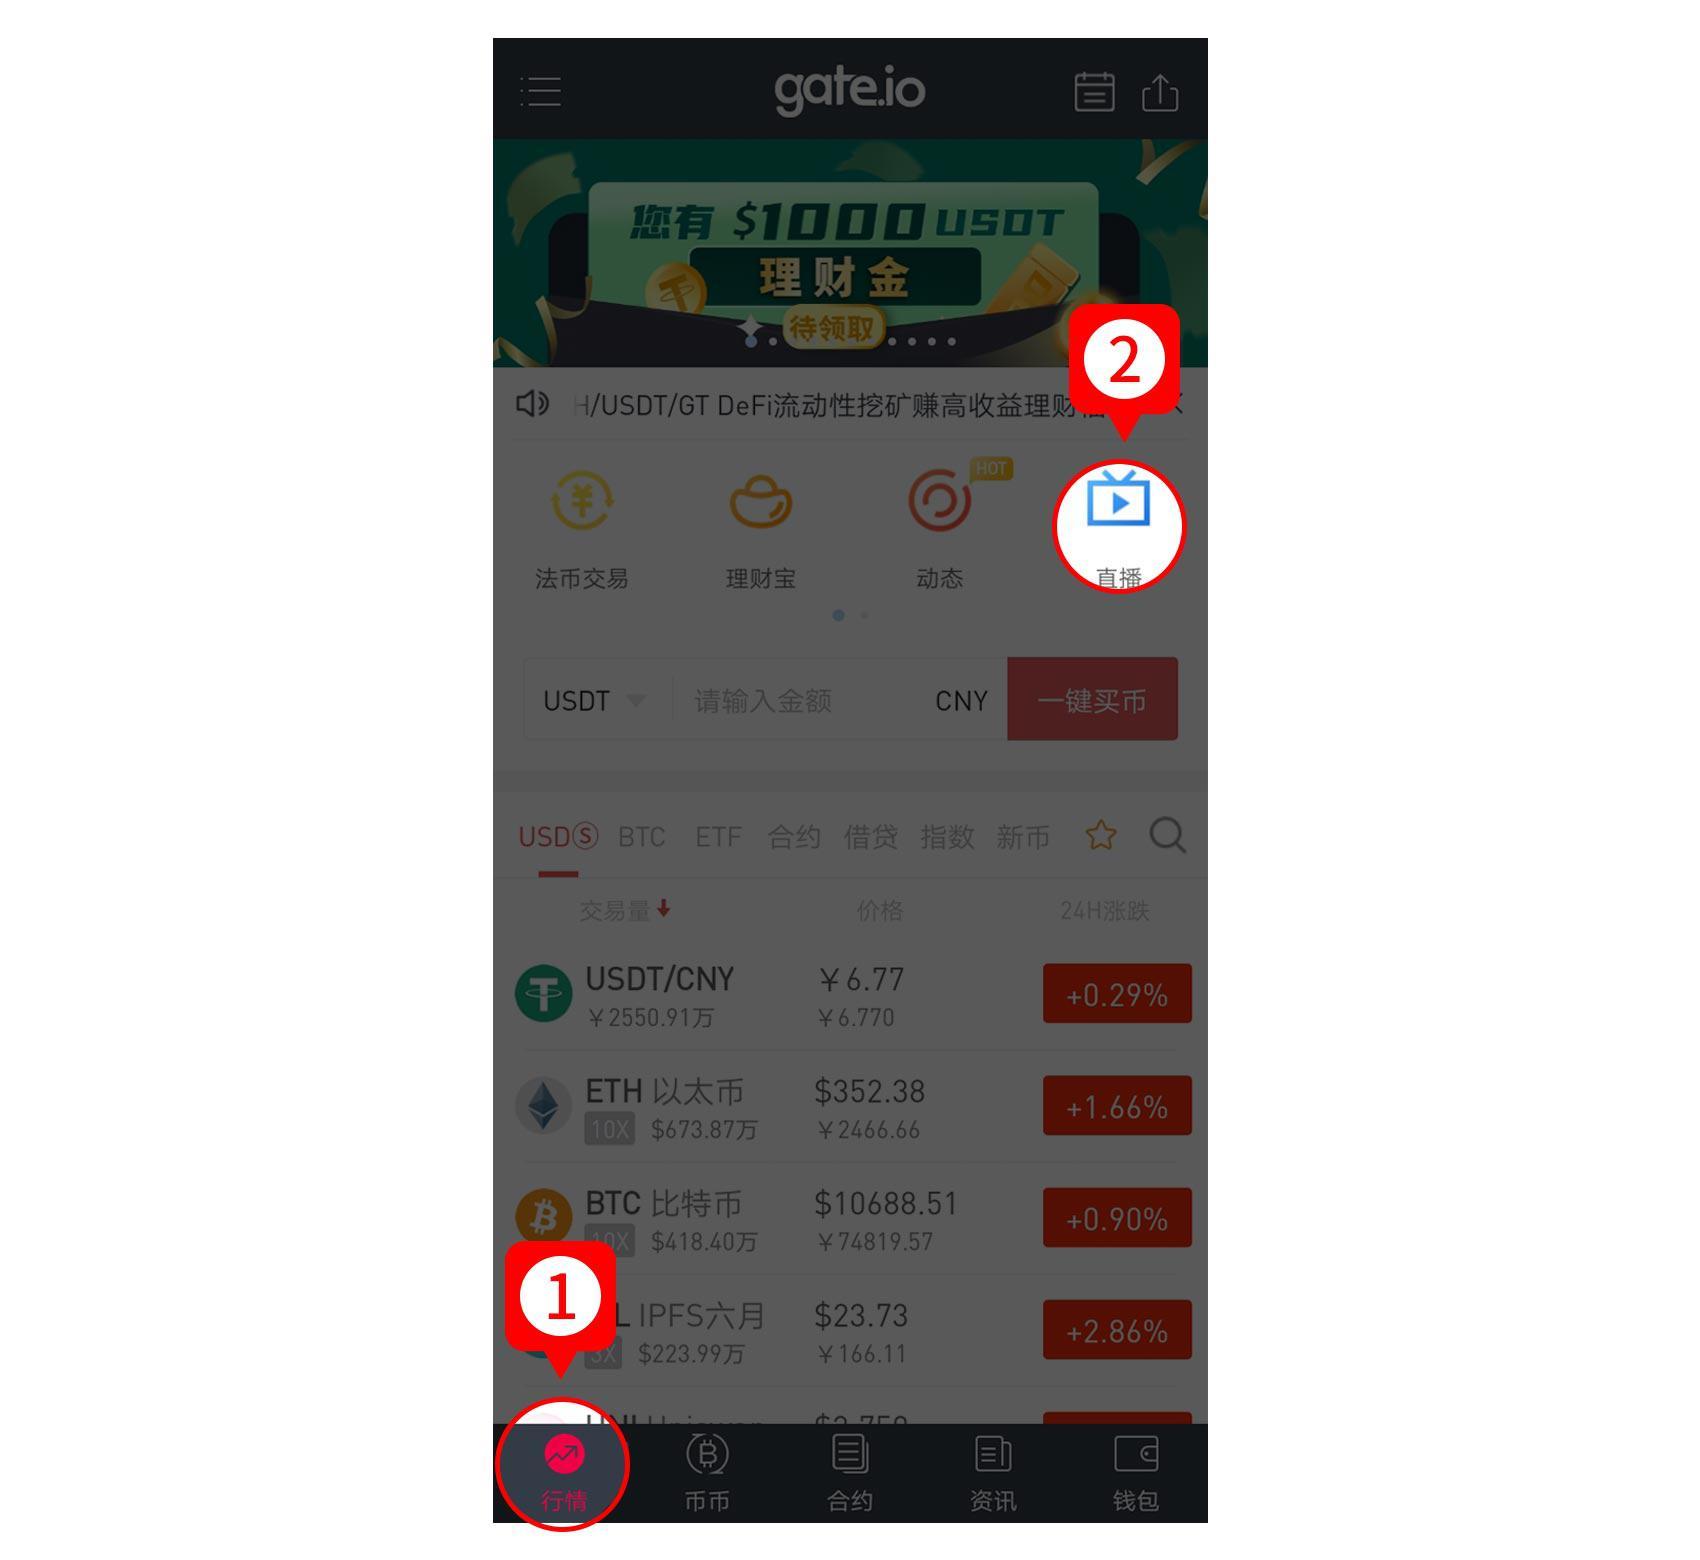 Gate.io今日直播新鲜看,市场分析、娱乐互动等18个节目即将开播-公告-Gate.io 芝麻开门交易所